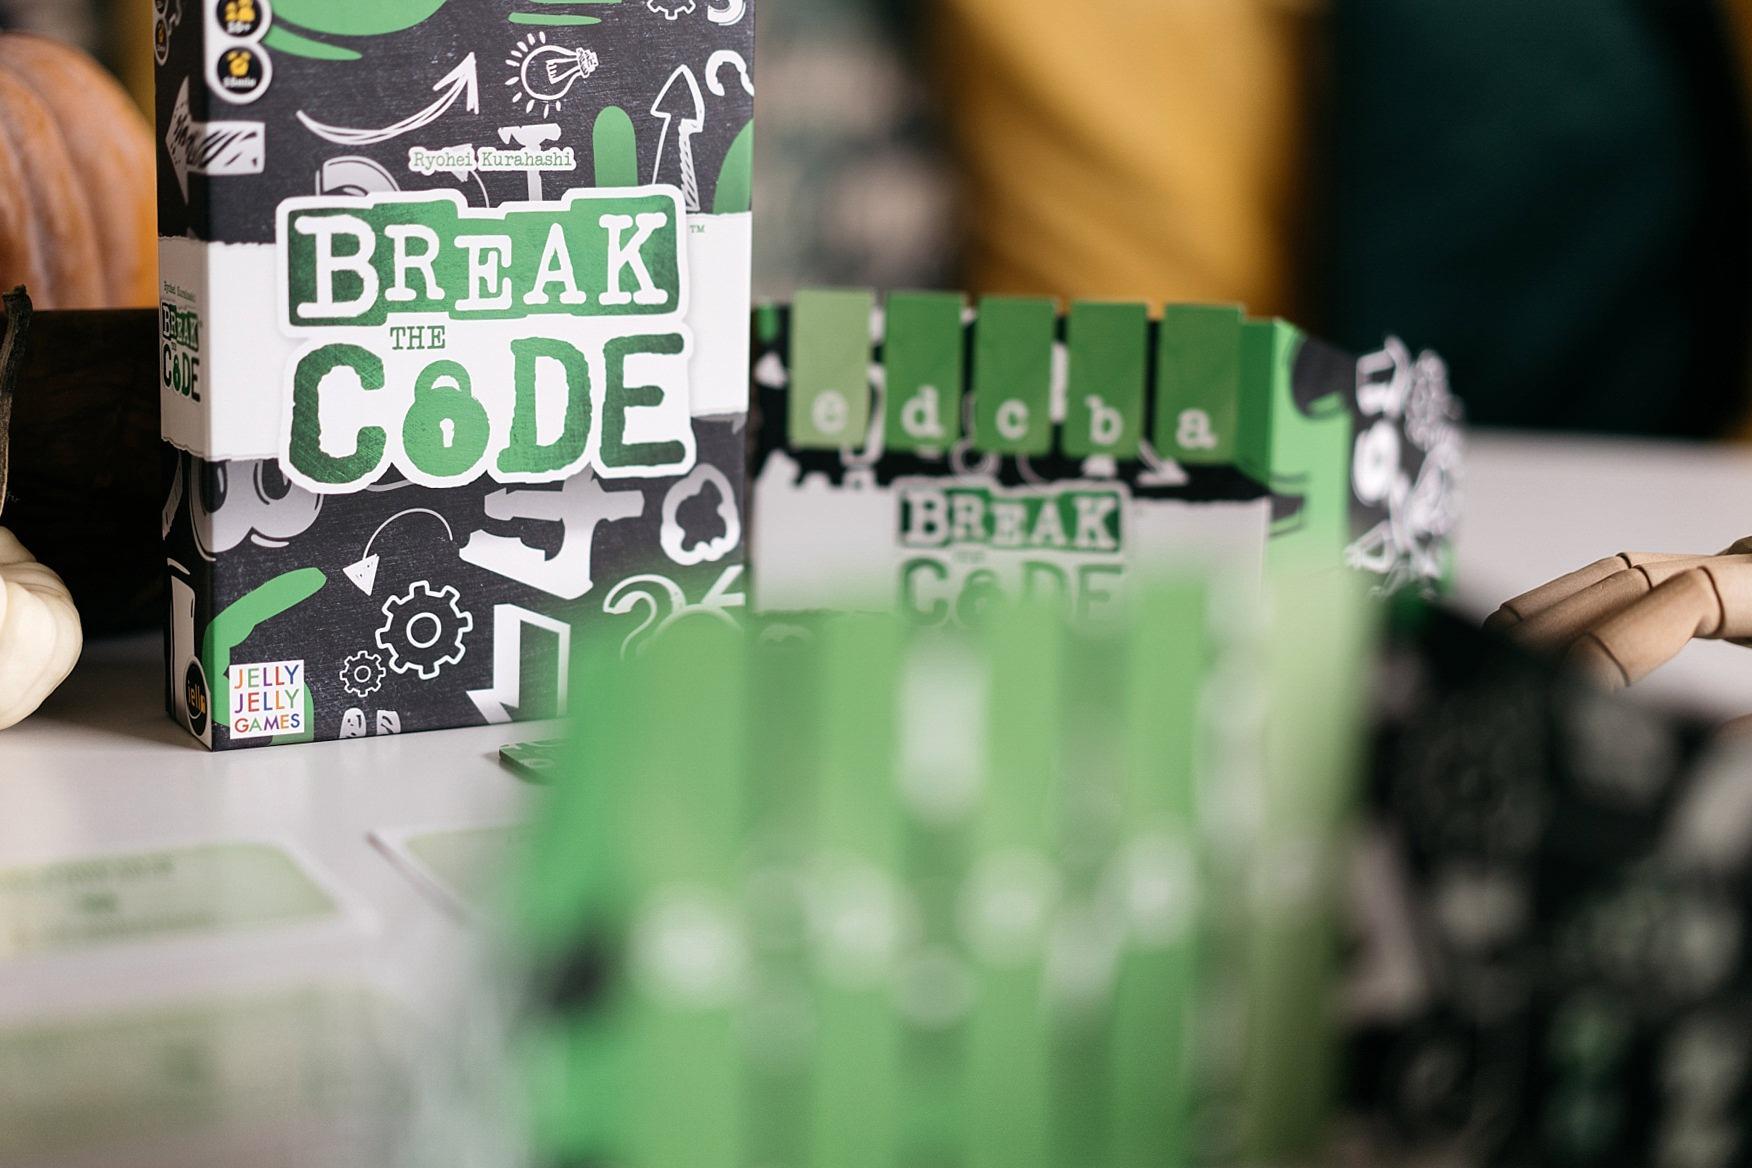 break the code iello jeu de société